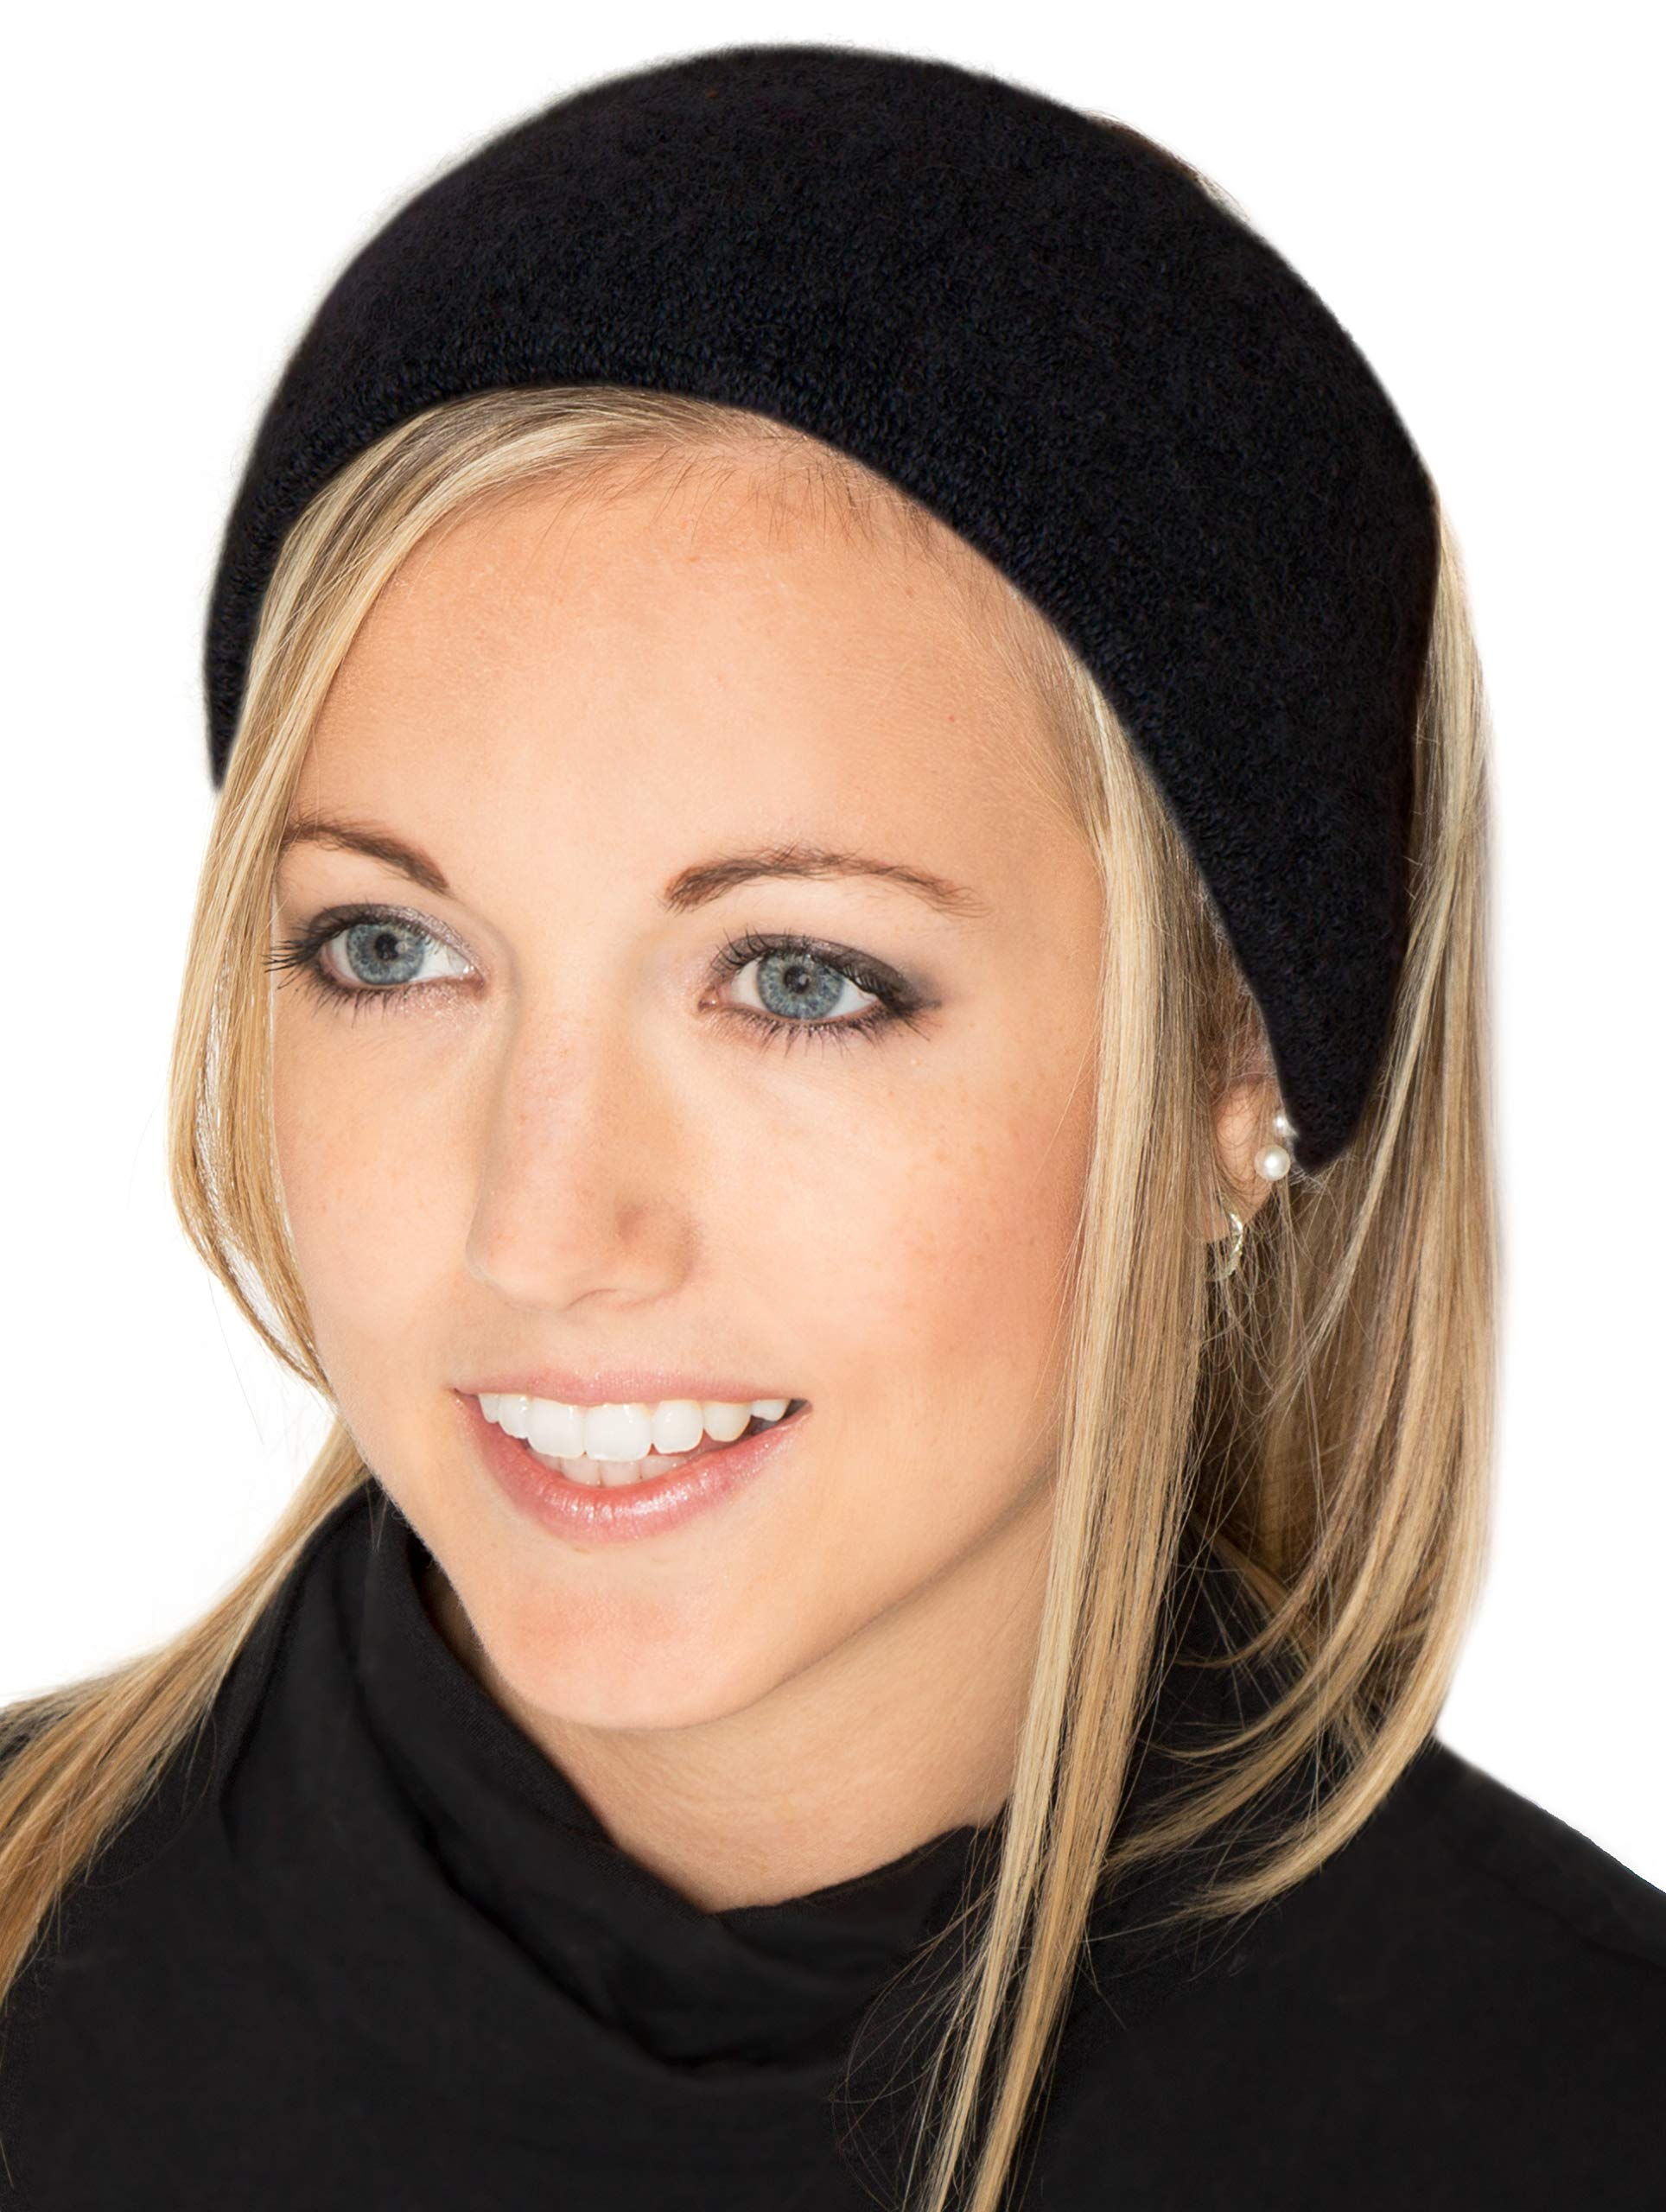 LUXURY ALPACA Ear Warmer Headband Ski/Snowboard/Sport Infused with JOJOBA Oil - BEST NATURAL THERMAL PROTECTION - Black - AndeanSun